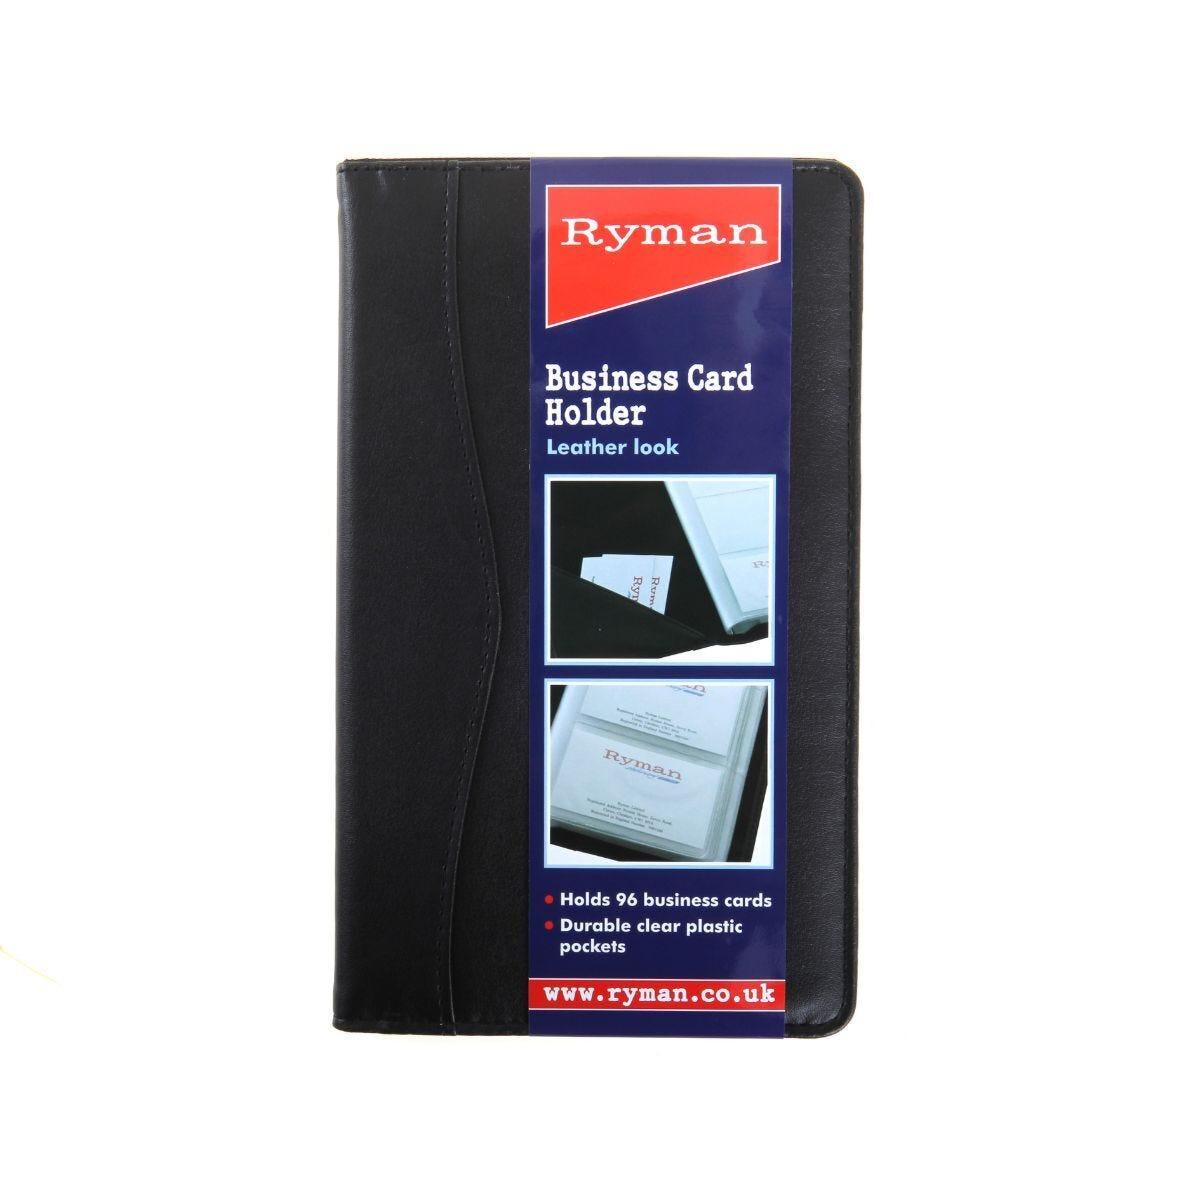 Ryman Business Card Holder 96 Cards